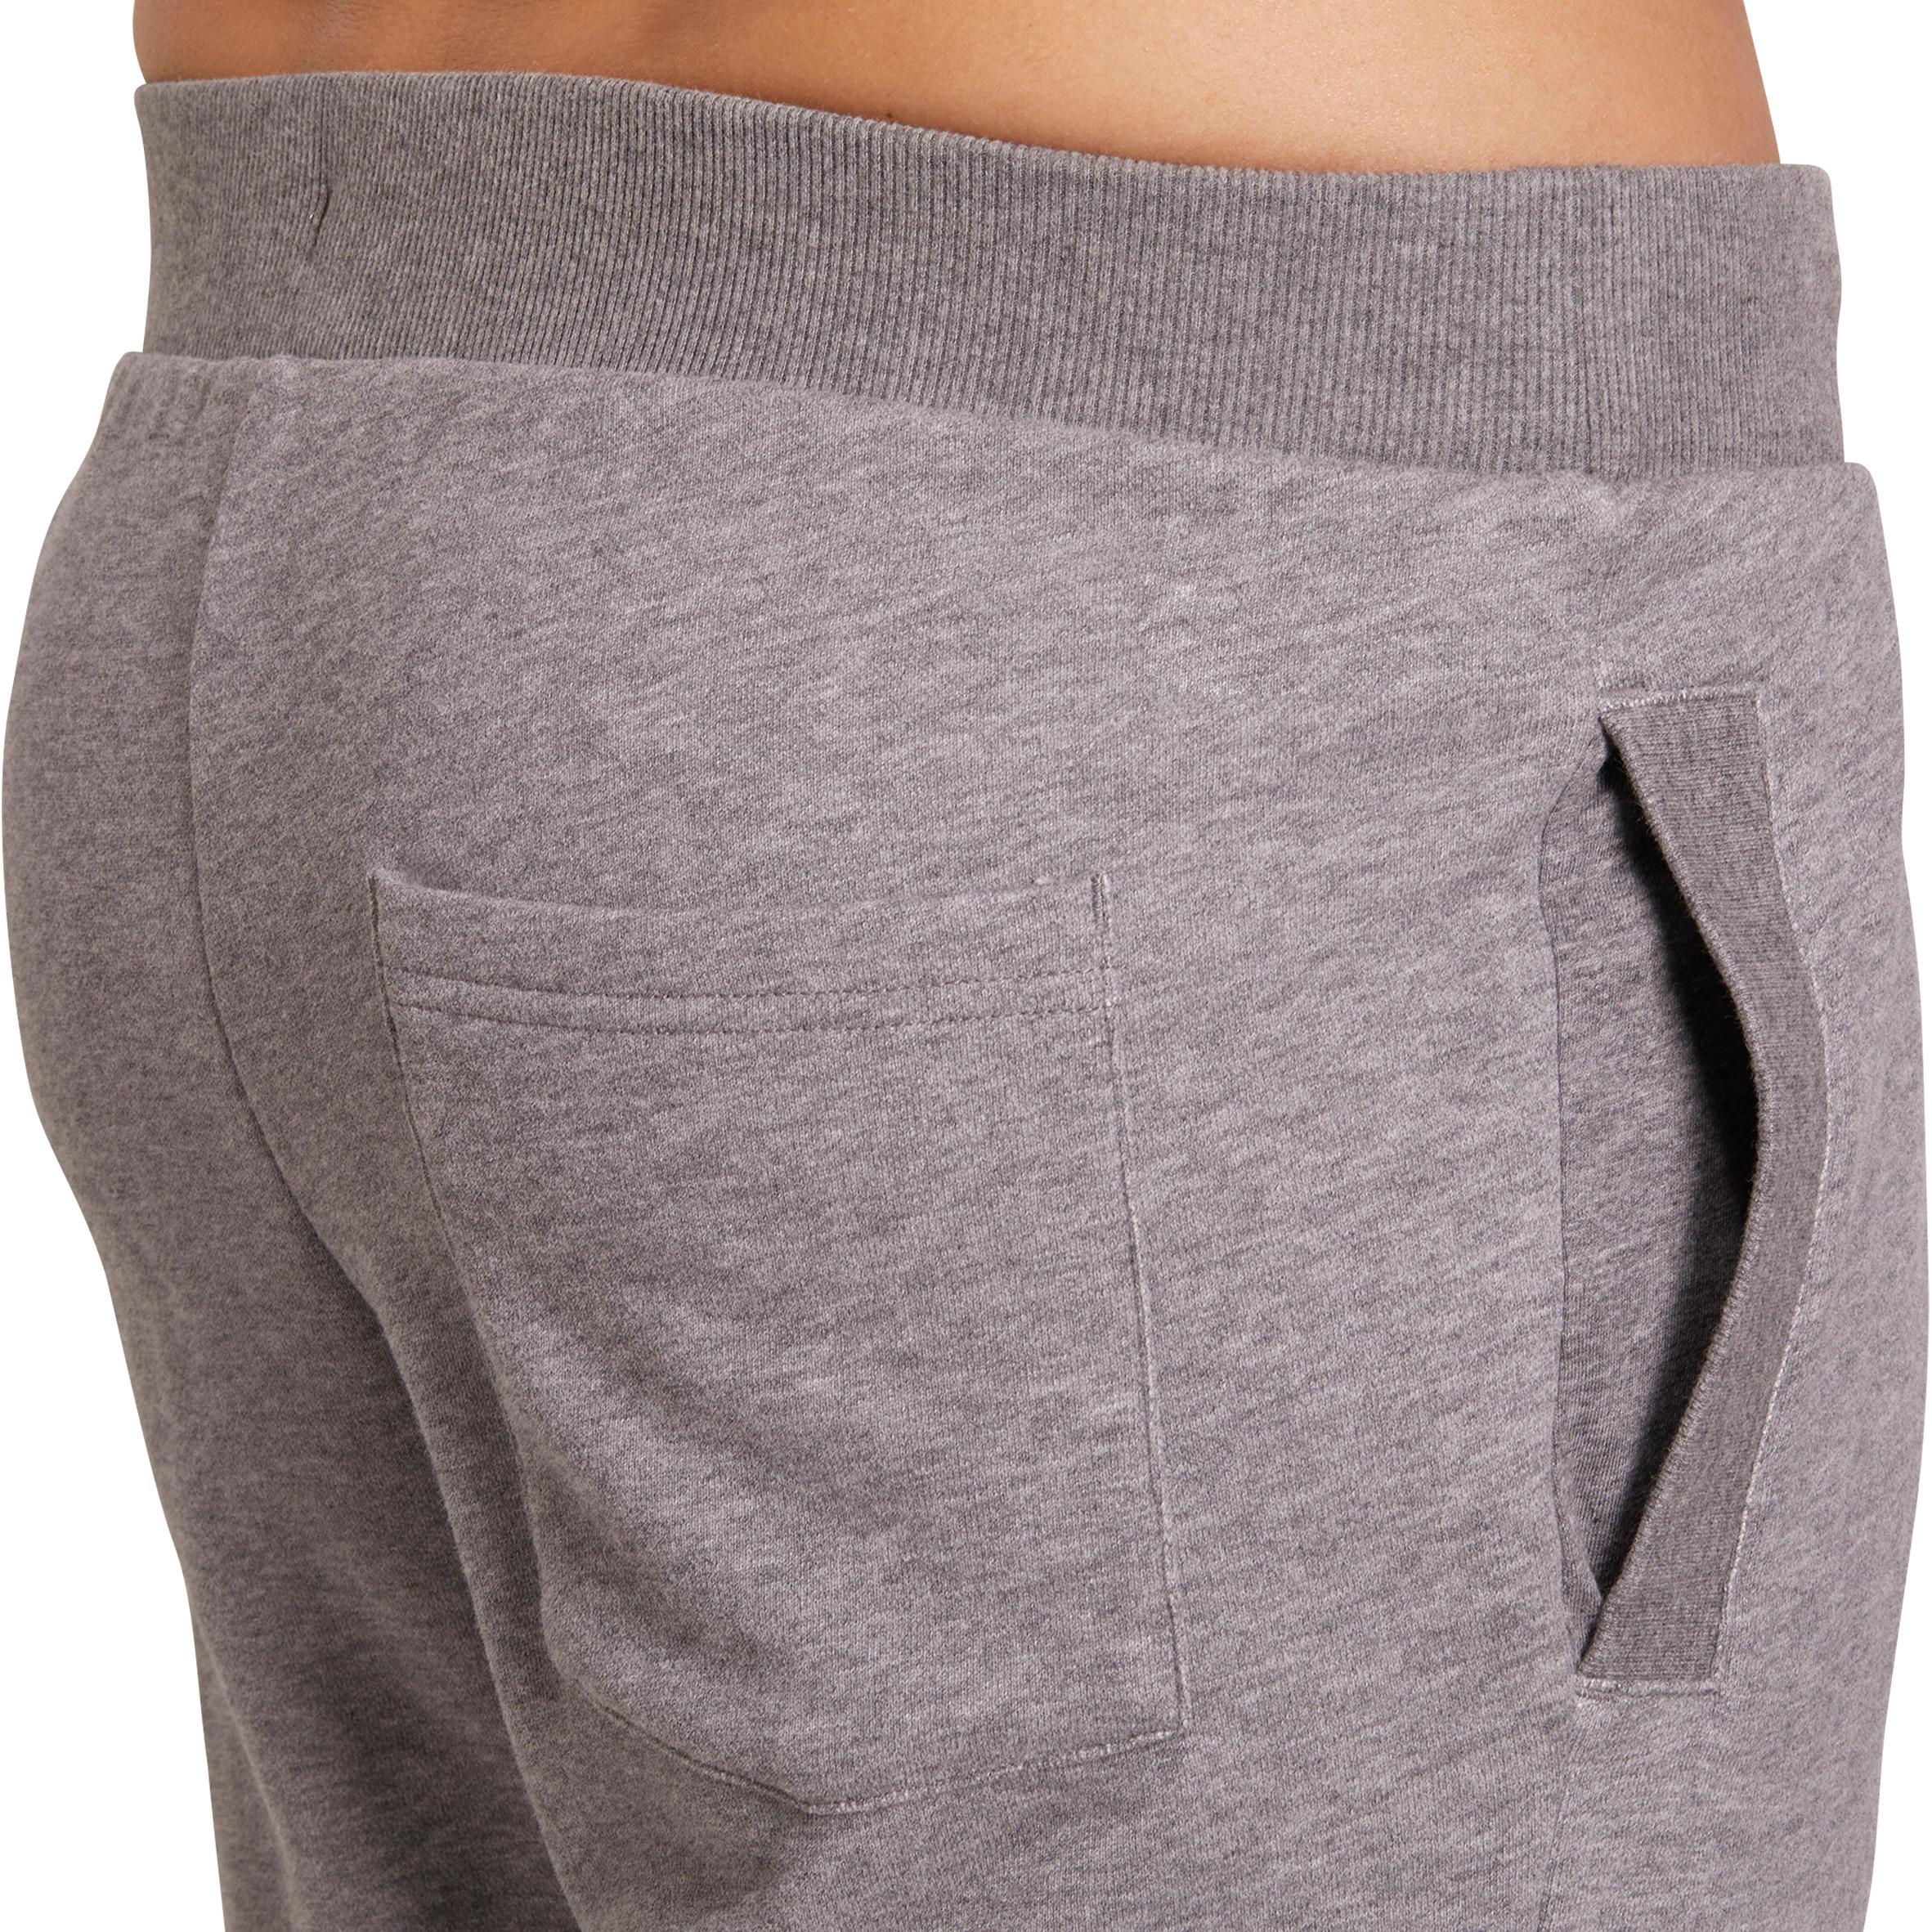 Slim-Fit Plush Loop Gym & Pilates Bottoms - Grey